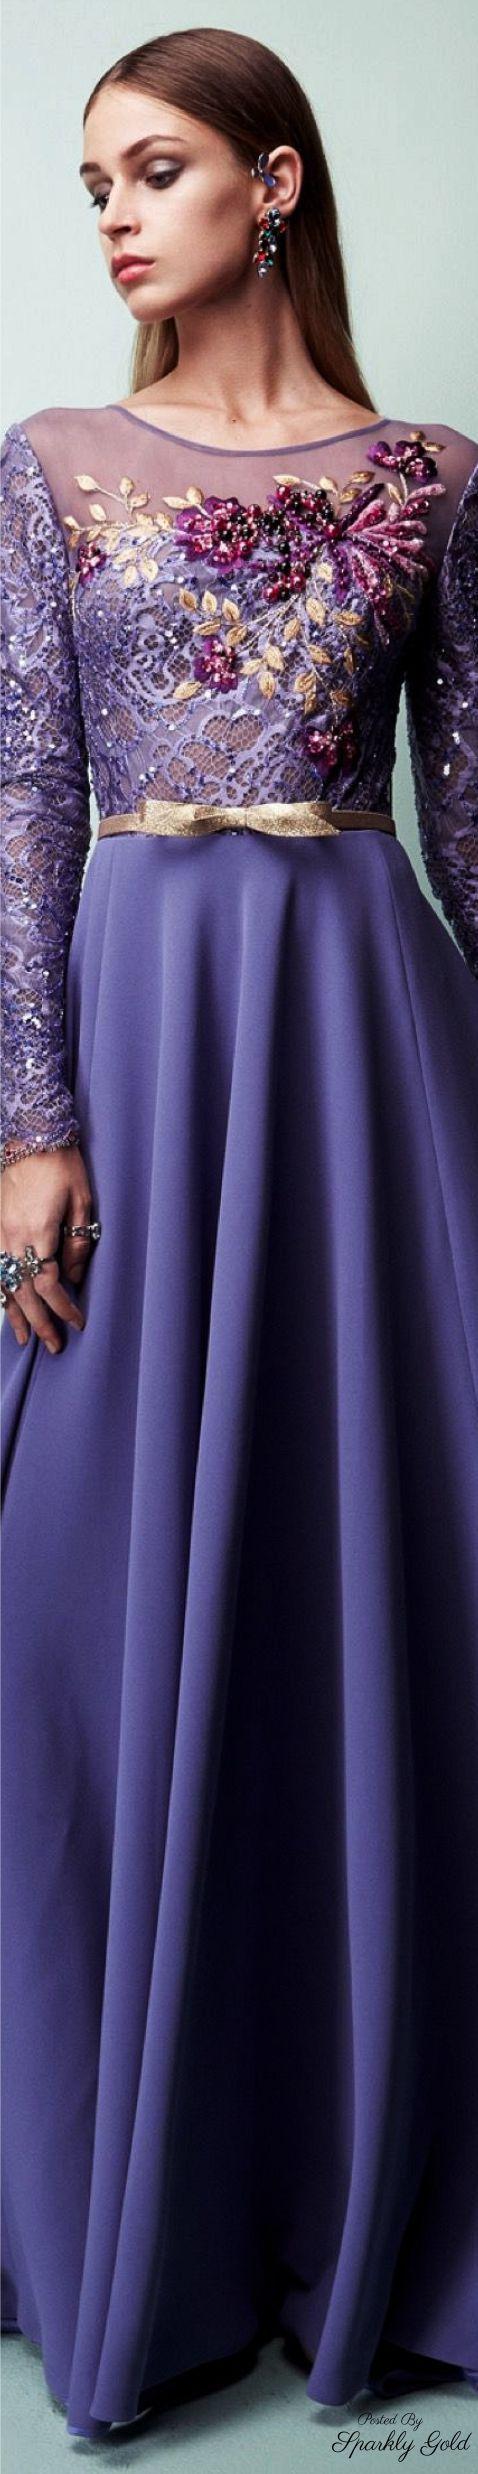 Georges Hobeika Haute Couture | Women\'s fashion | Pinterest | Alta ...